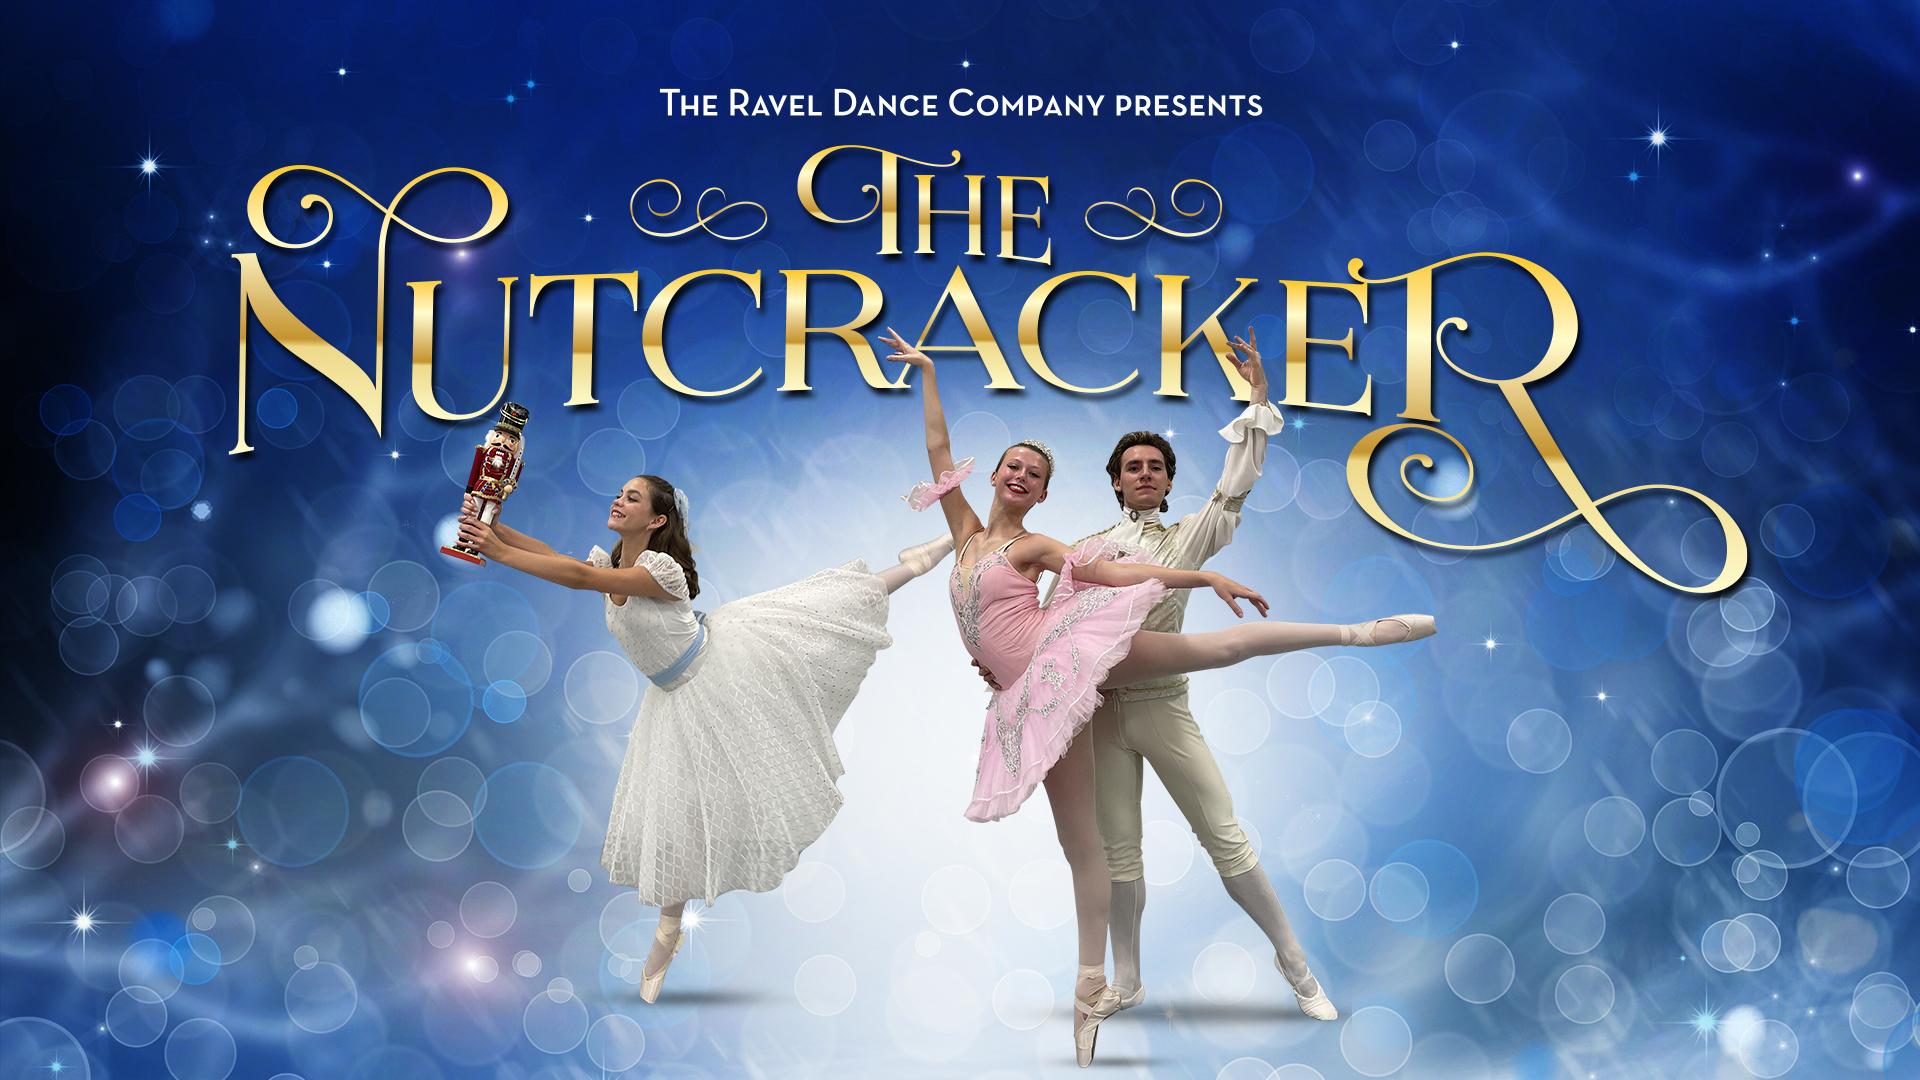 Ravel Dance Company, capital one hall, capital one center, things to do in DC, Tysons, nutcracker, the nutcracker, ballet